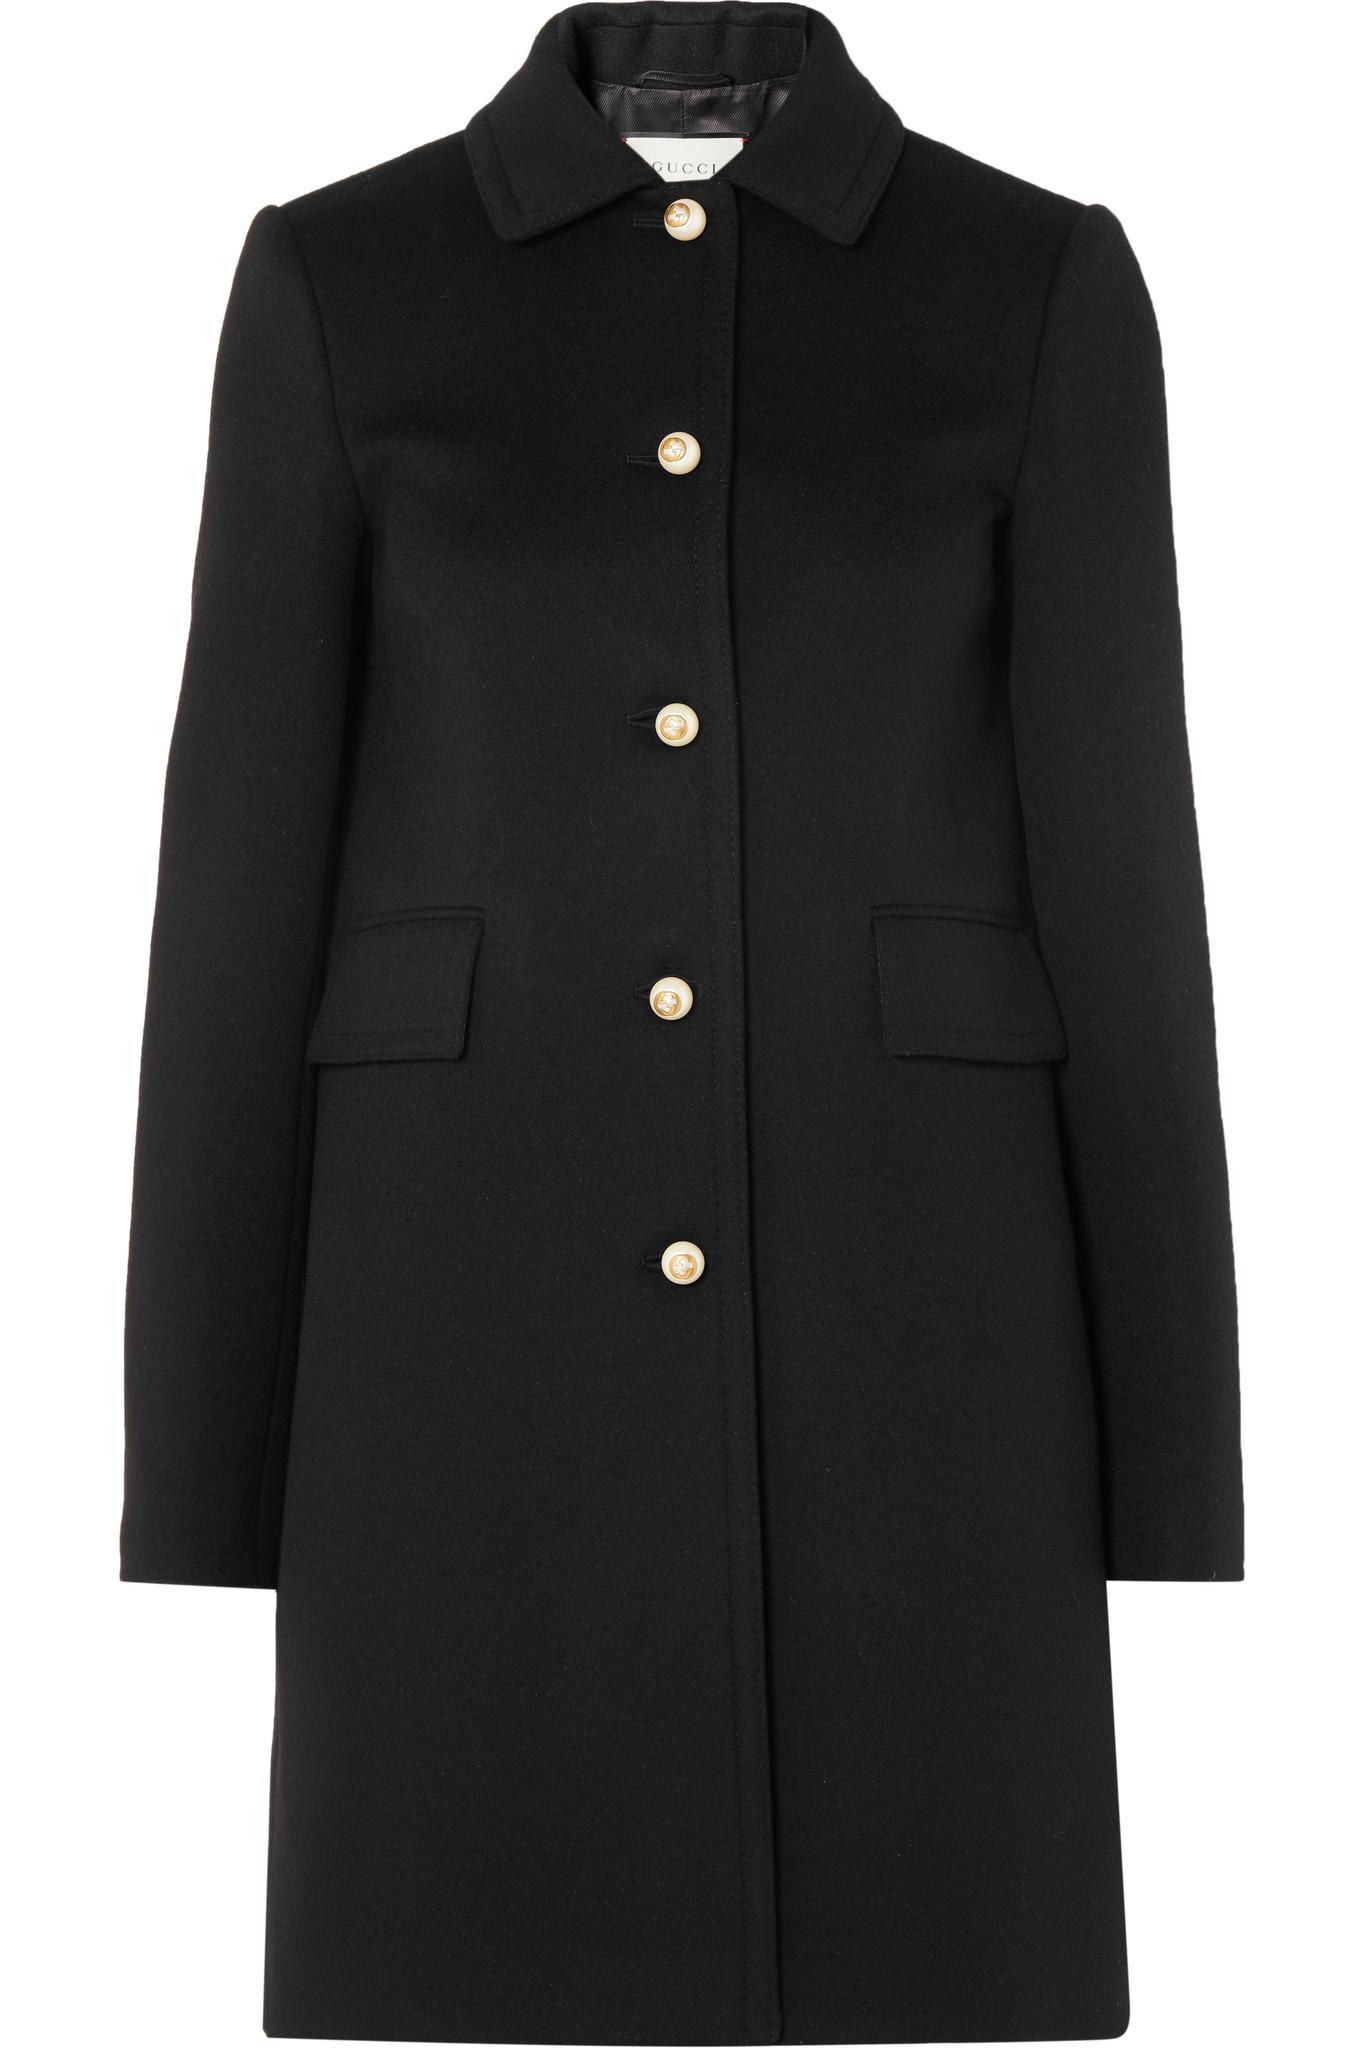 9cfc2844d06f2 Gucci - Black Faux Pearl-embellished Wool Coat - Lyst. View fullscreen